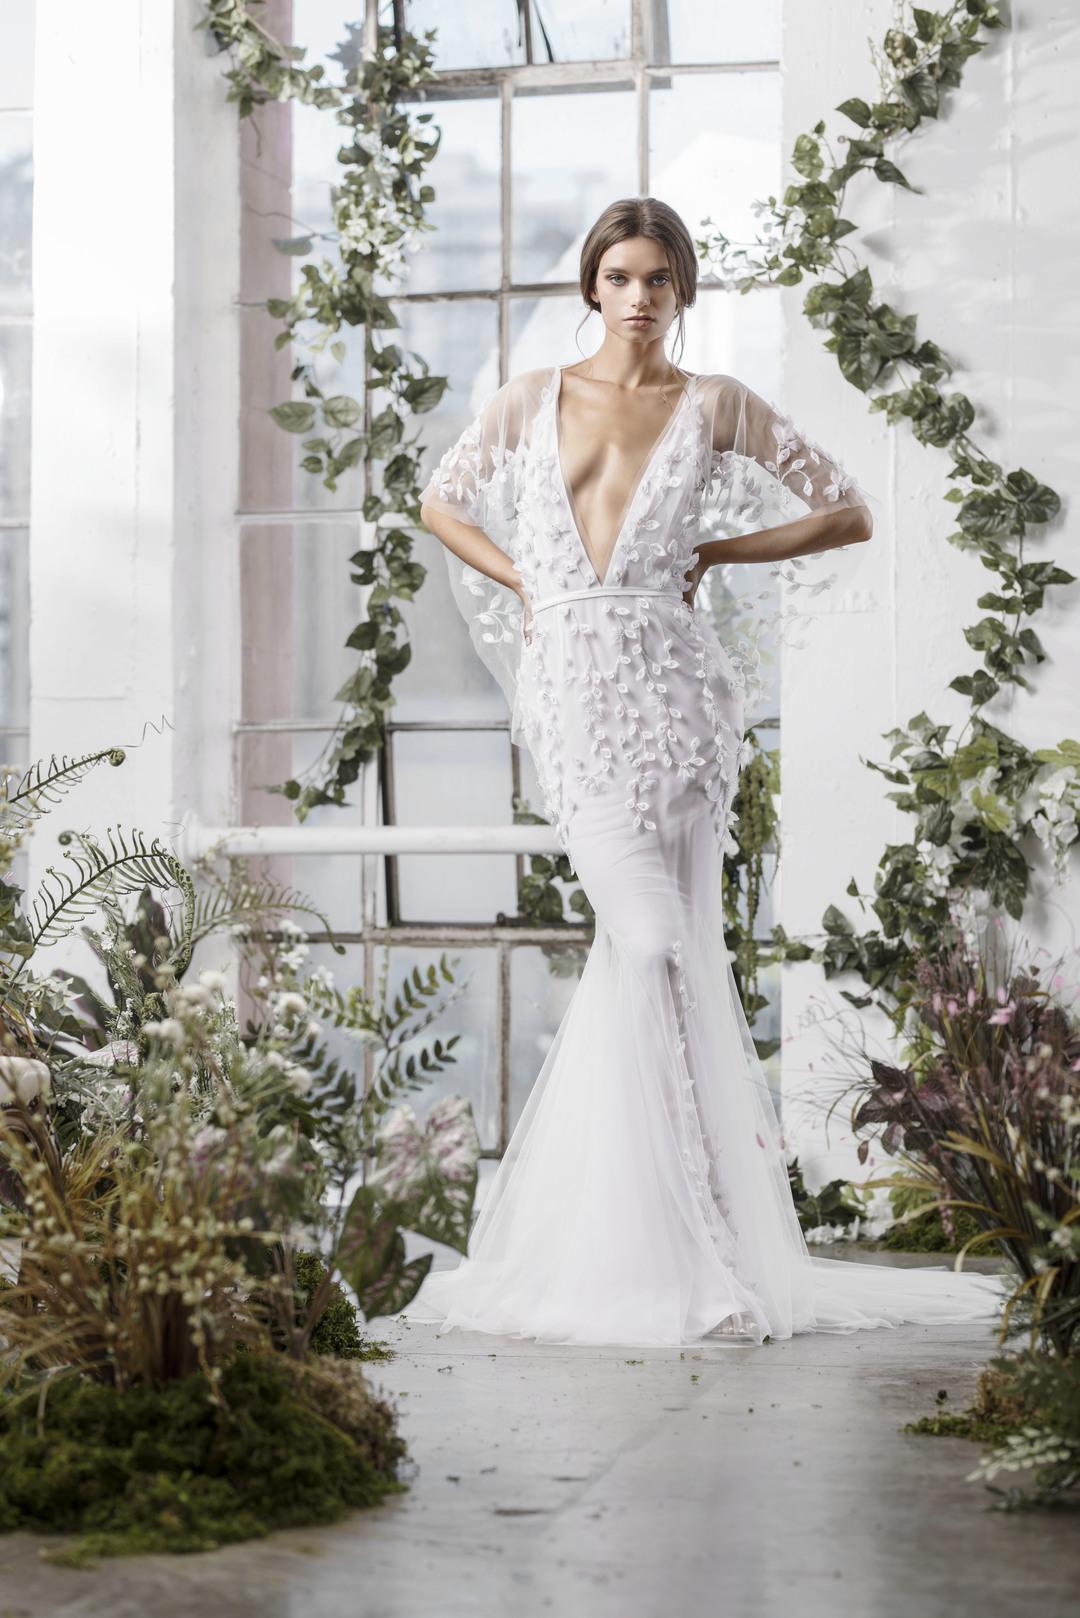 calypso dress photo